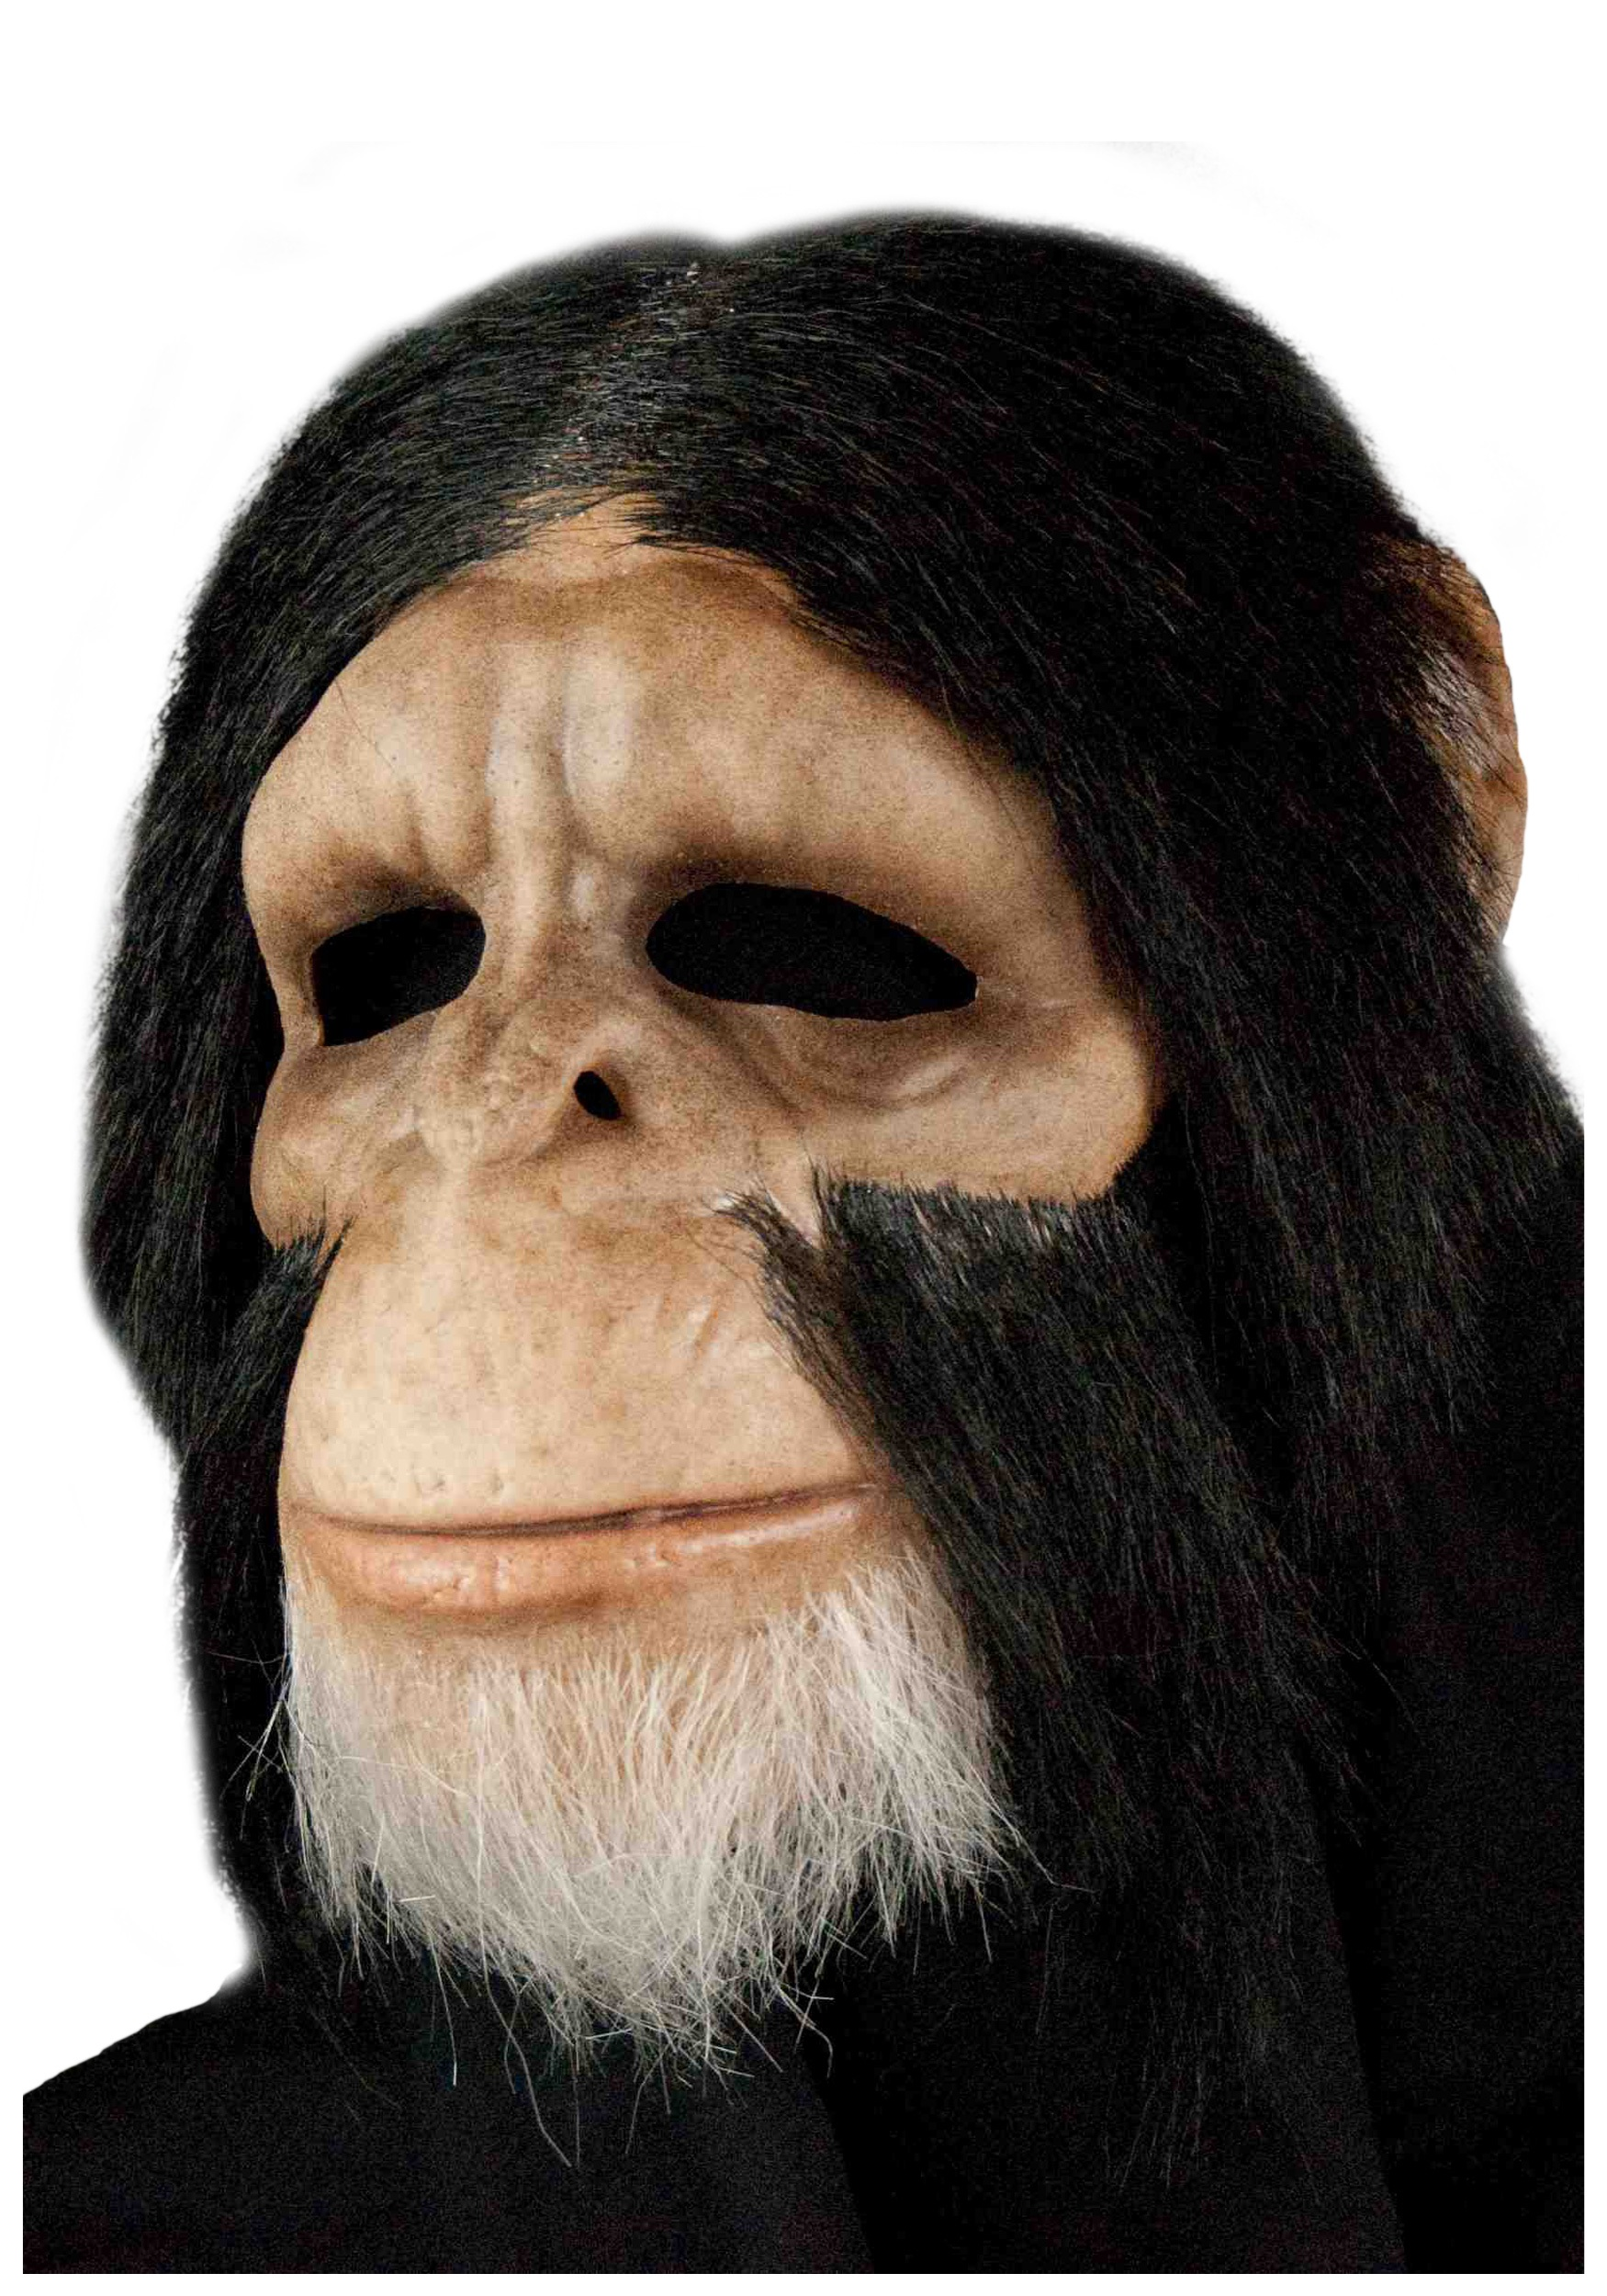 Scary Chimp Mask - Adult Discount Halloween Monkey Masks